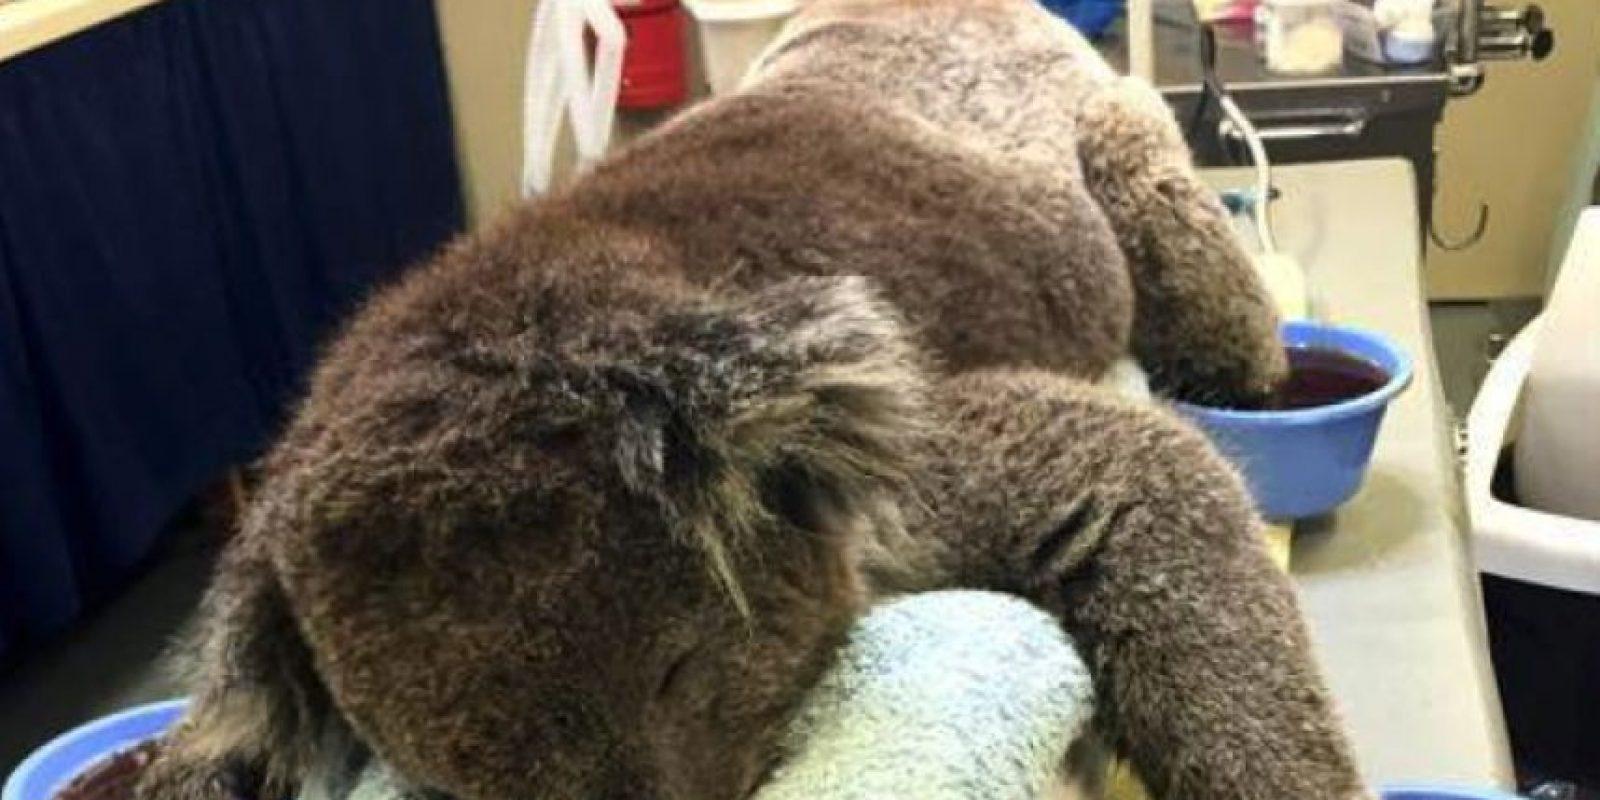 Foto:Vía Facebook.com/pages/Australian-Marine-Wildlife-Research-Rescue-Organisation-Inc-AMWRRO